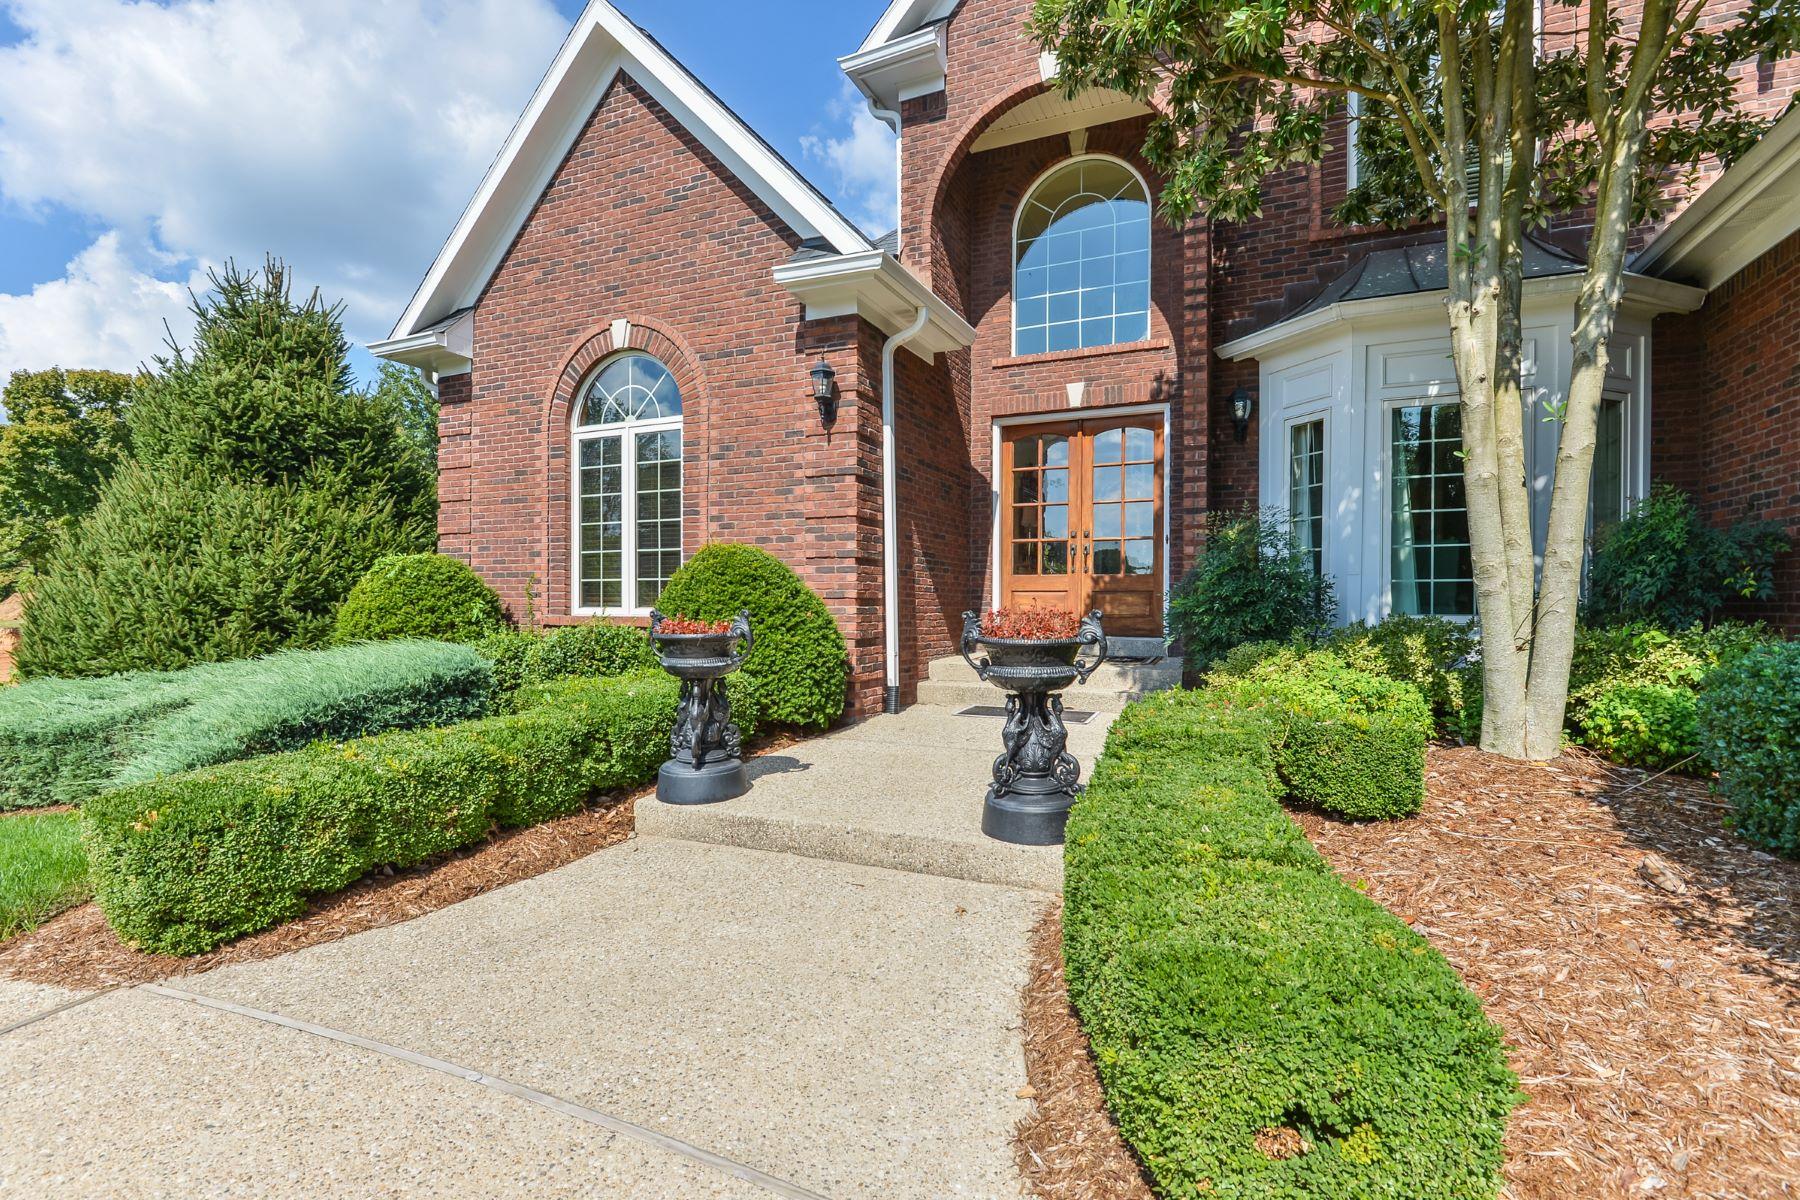 Single Family Homes for Sale at 5403 Farm Ridge Lane Prospect, Kentucky 40059 United States